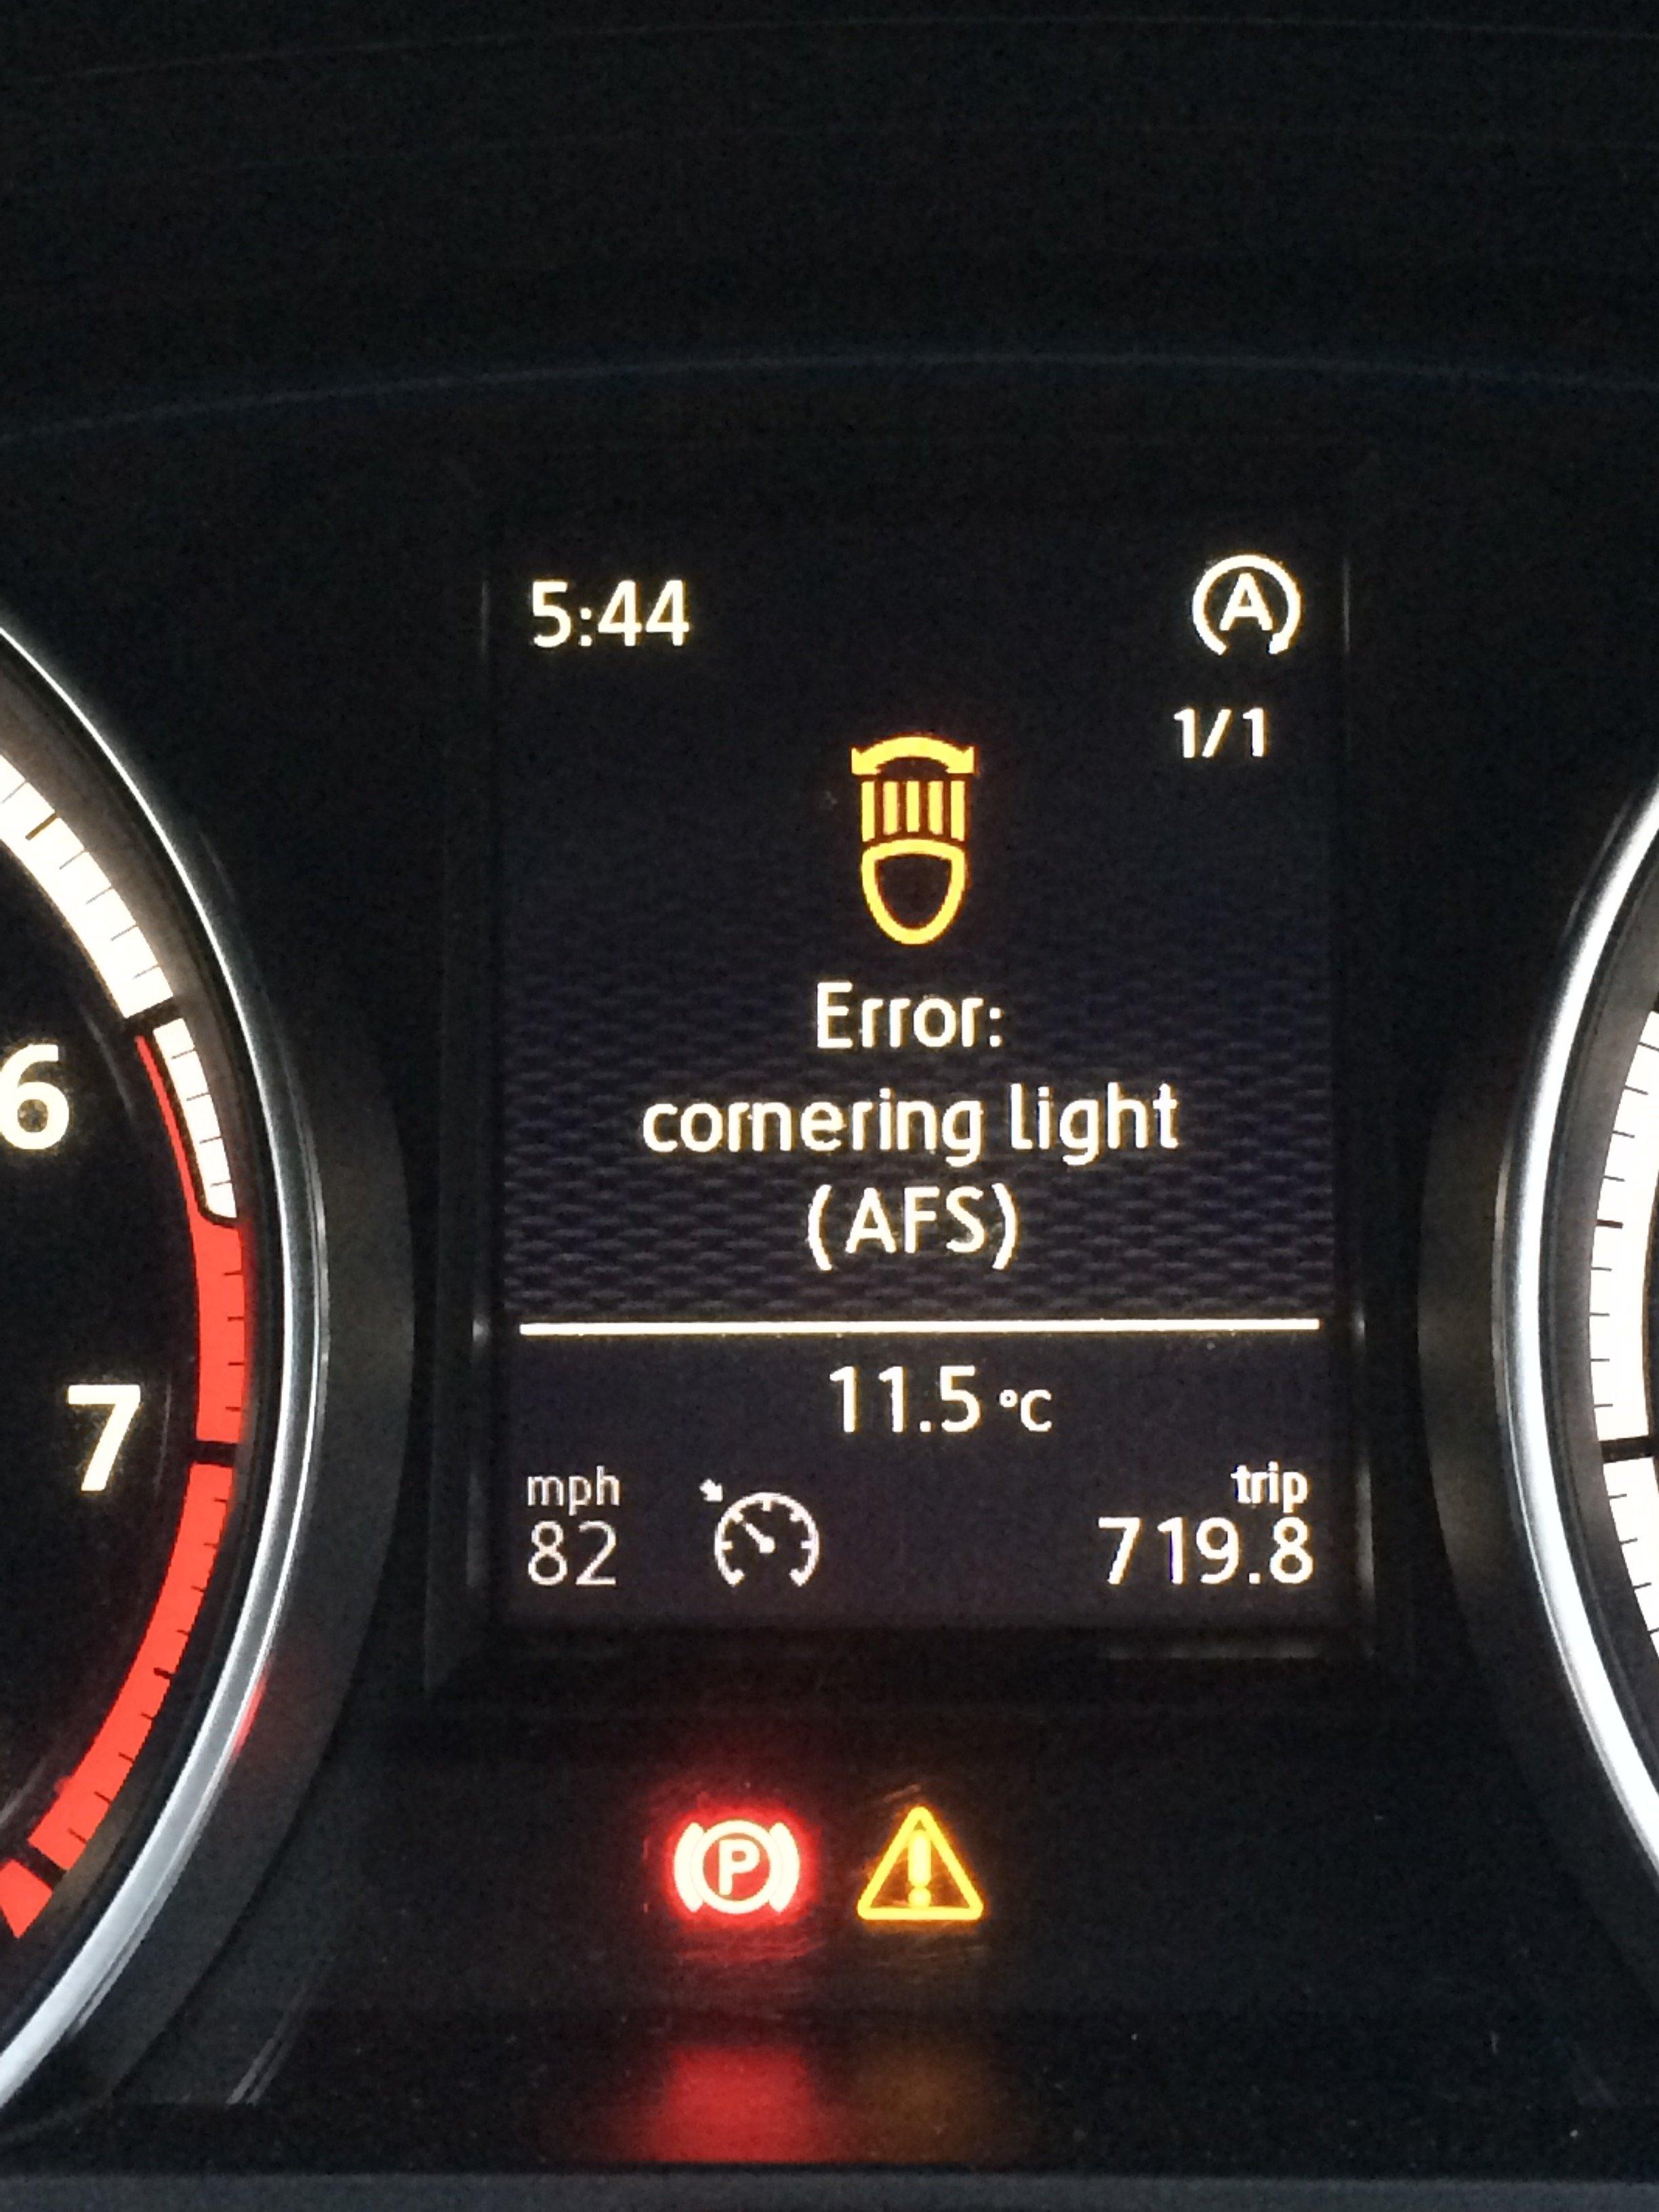 Cornering light - VW Golf R MK7 Chat - VWROC - VW R Owners Club